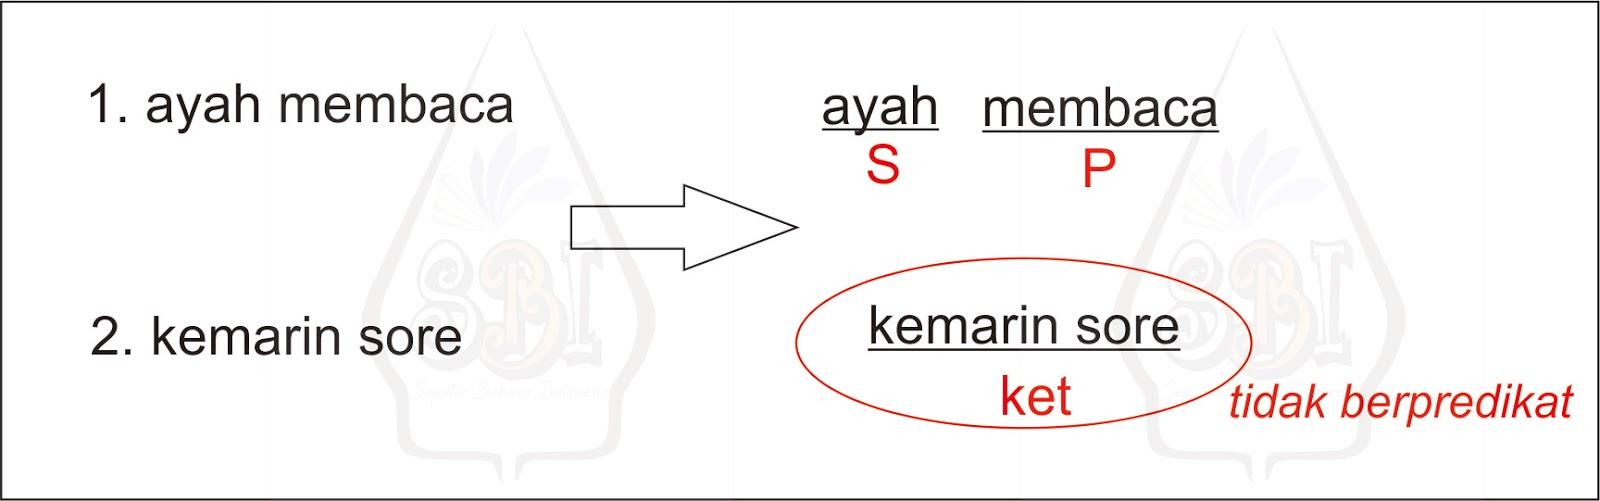 Pengertian Frasa Jenis Frasa Dan Contohnya Seputar Bahasa Indonesia